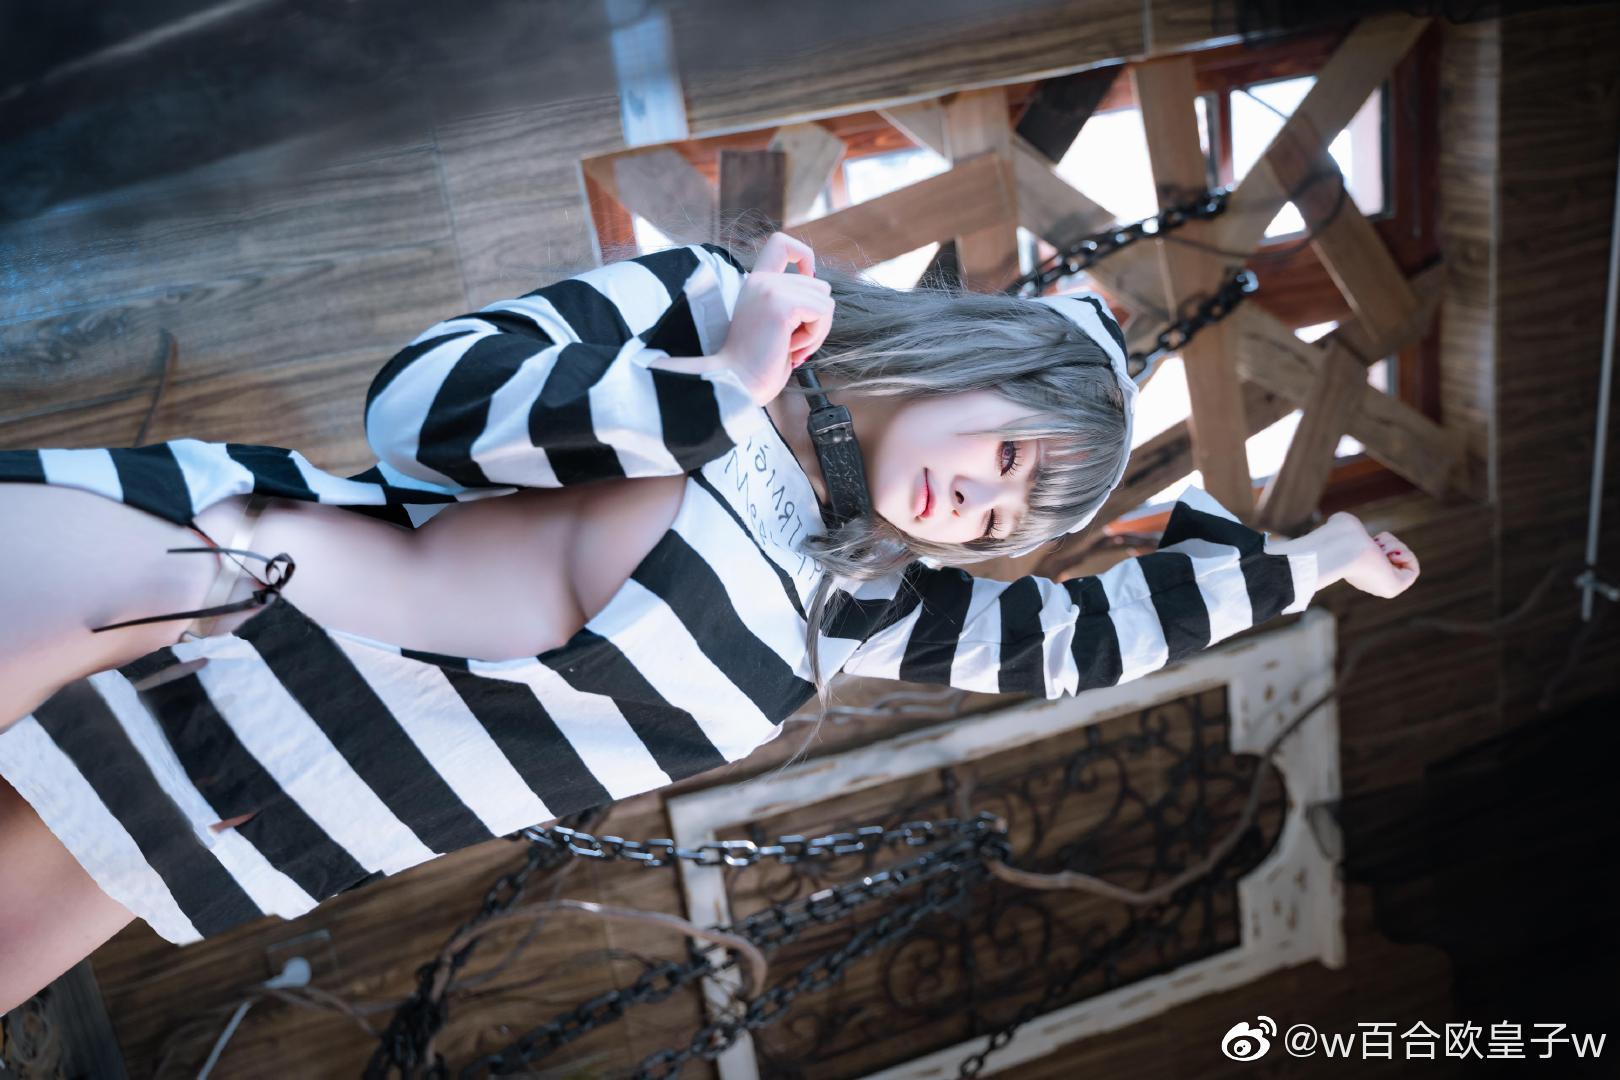 [COS]碧蓝航线 囚牢与诱惑 水星纪念 COSPLAY-第10张